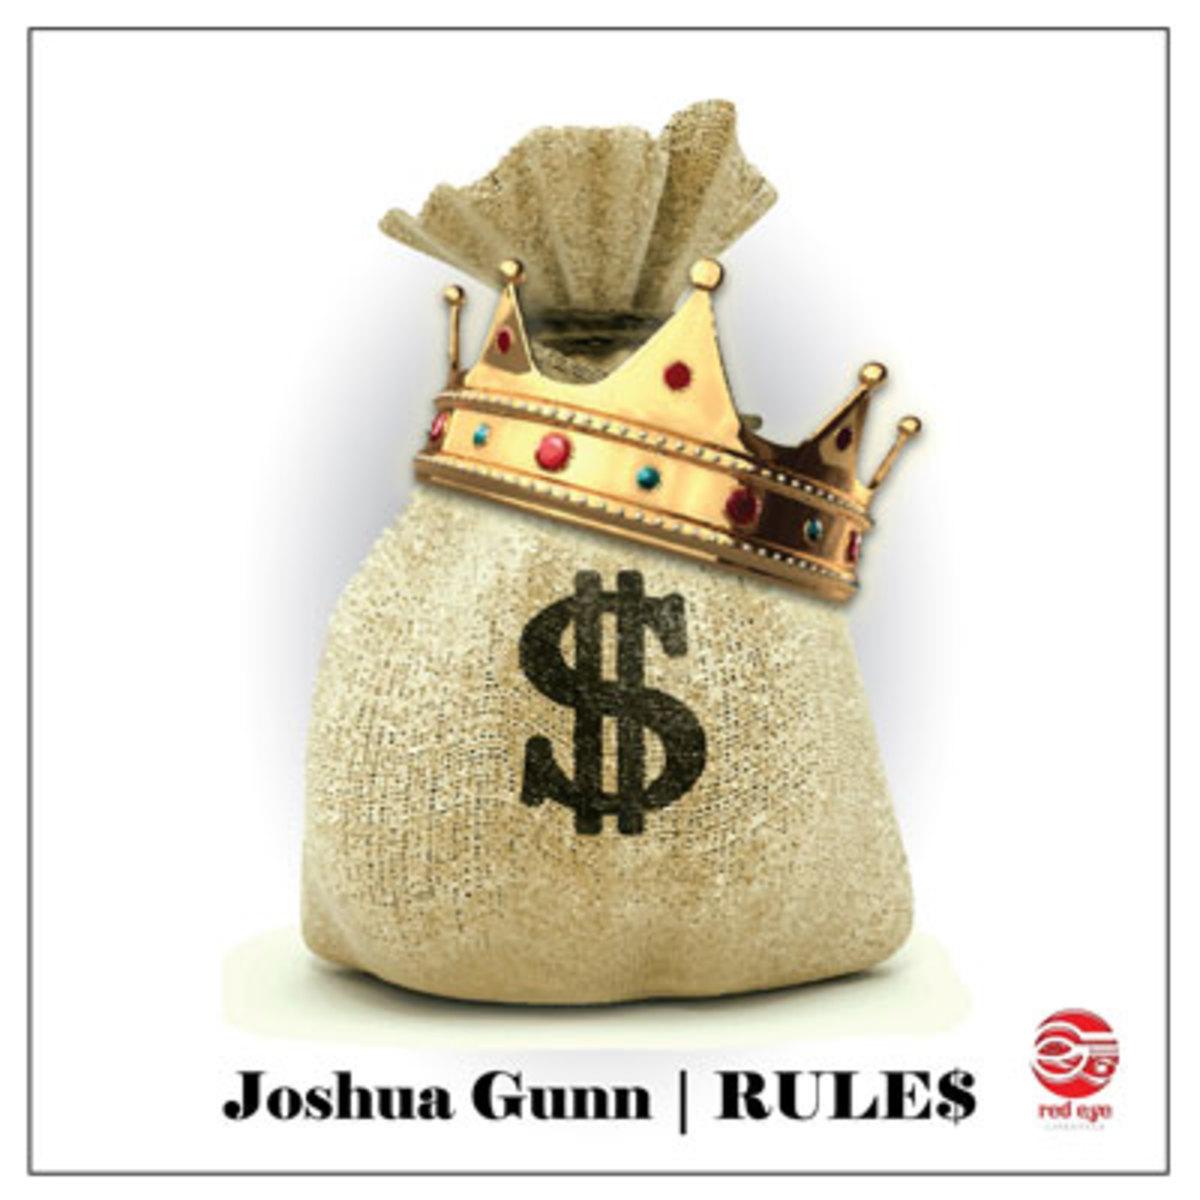 joshuagunn-cashrules.jpg